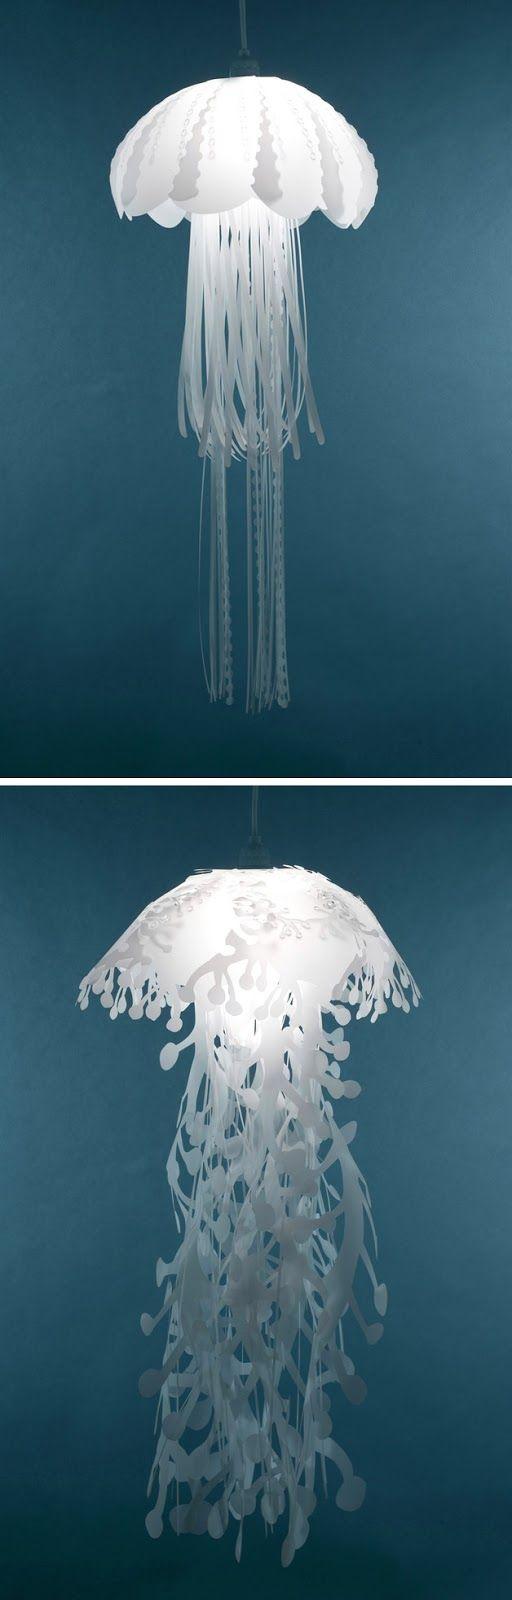 Unusual pendant lamps inspired by medusas digsdigs - Roc21 Lamparas Medusas